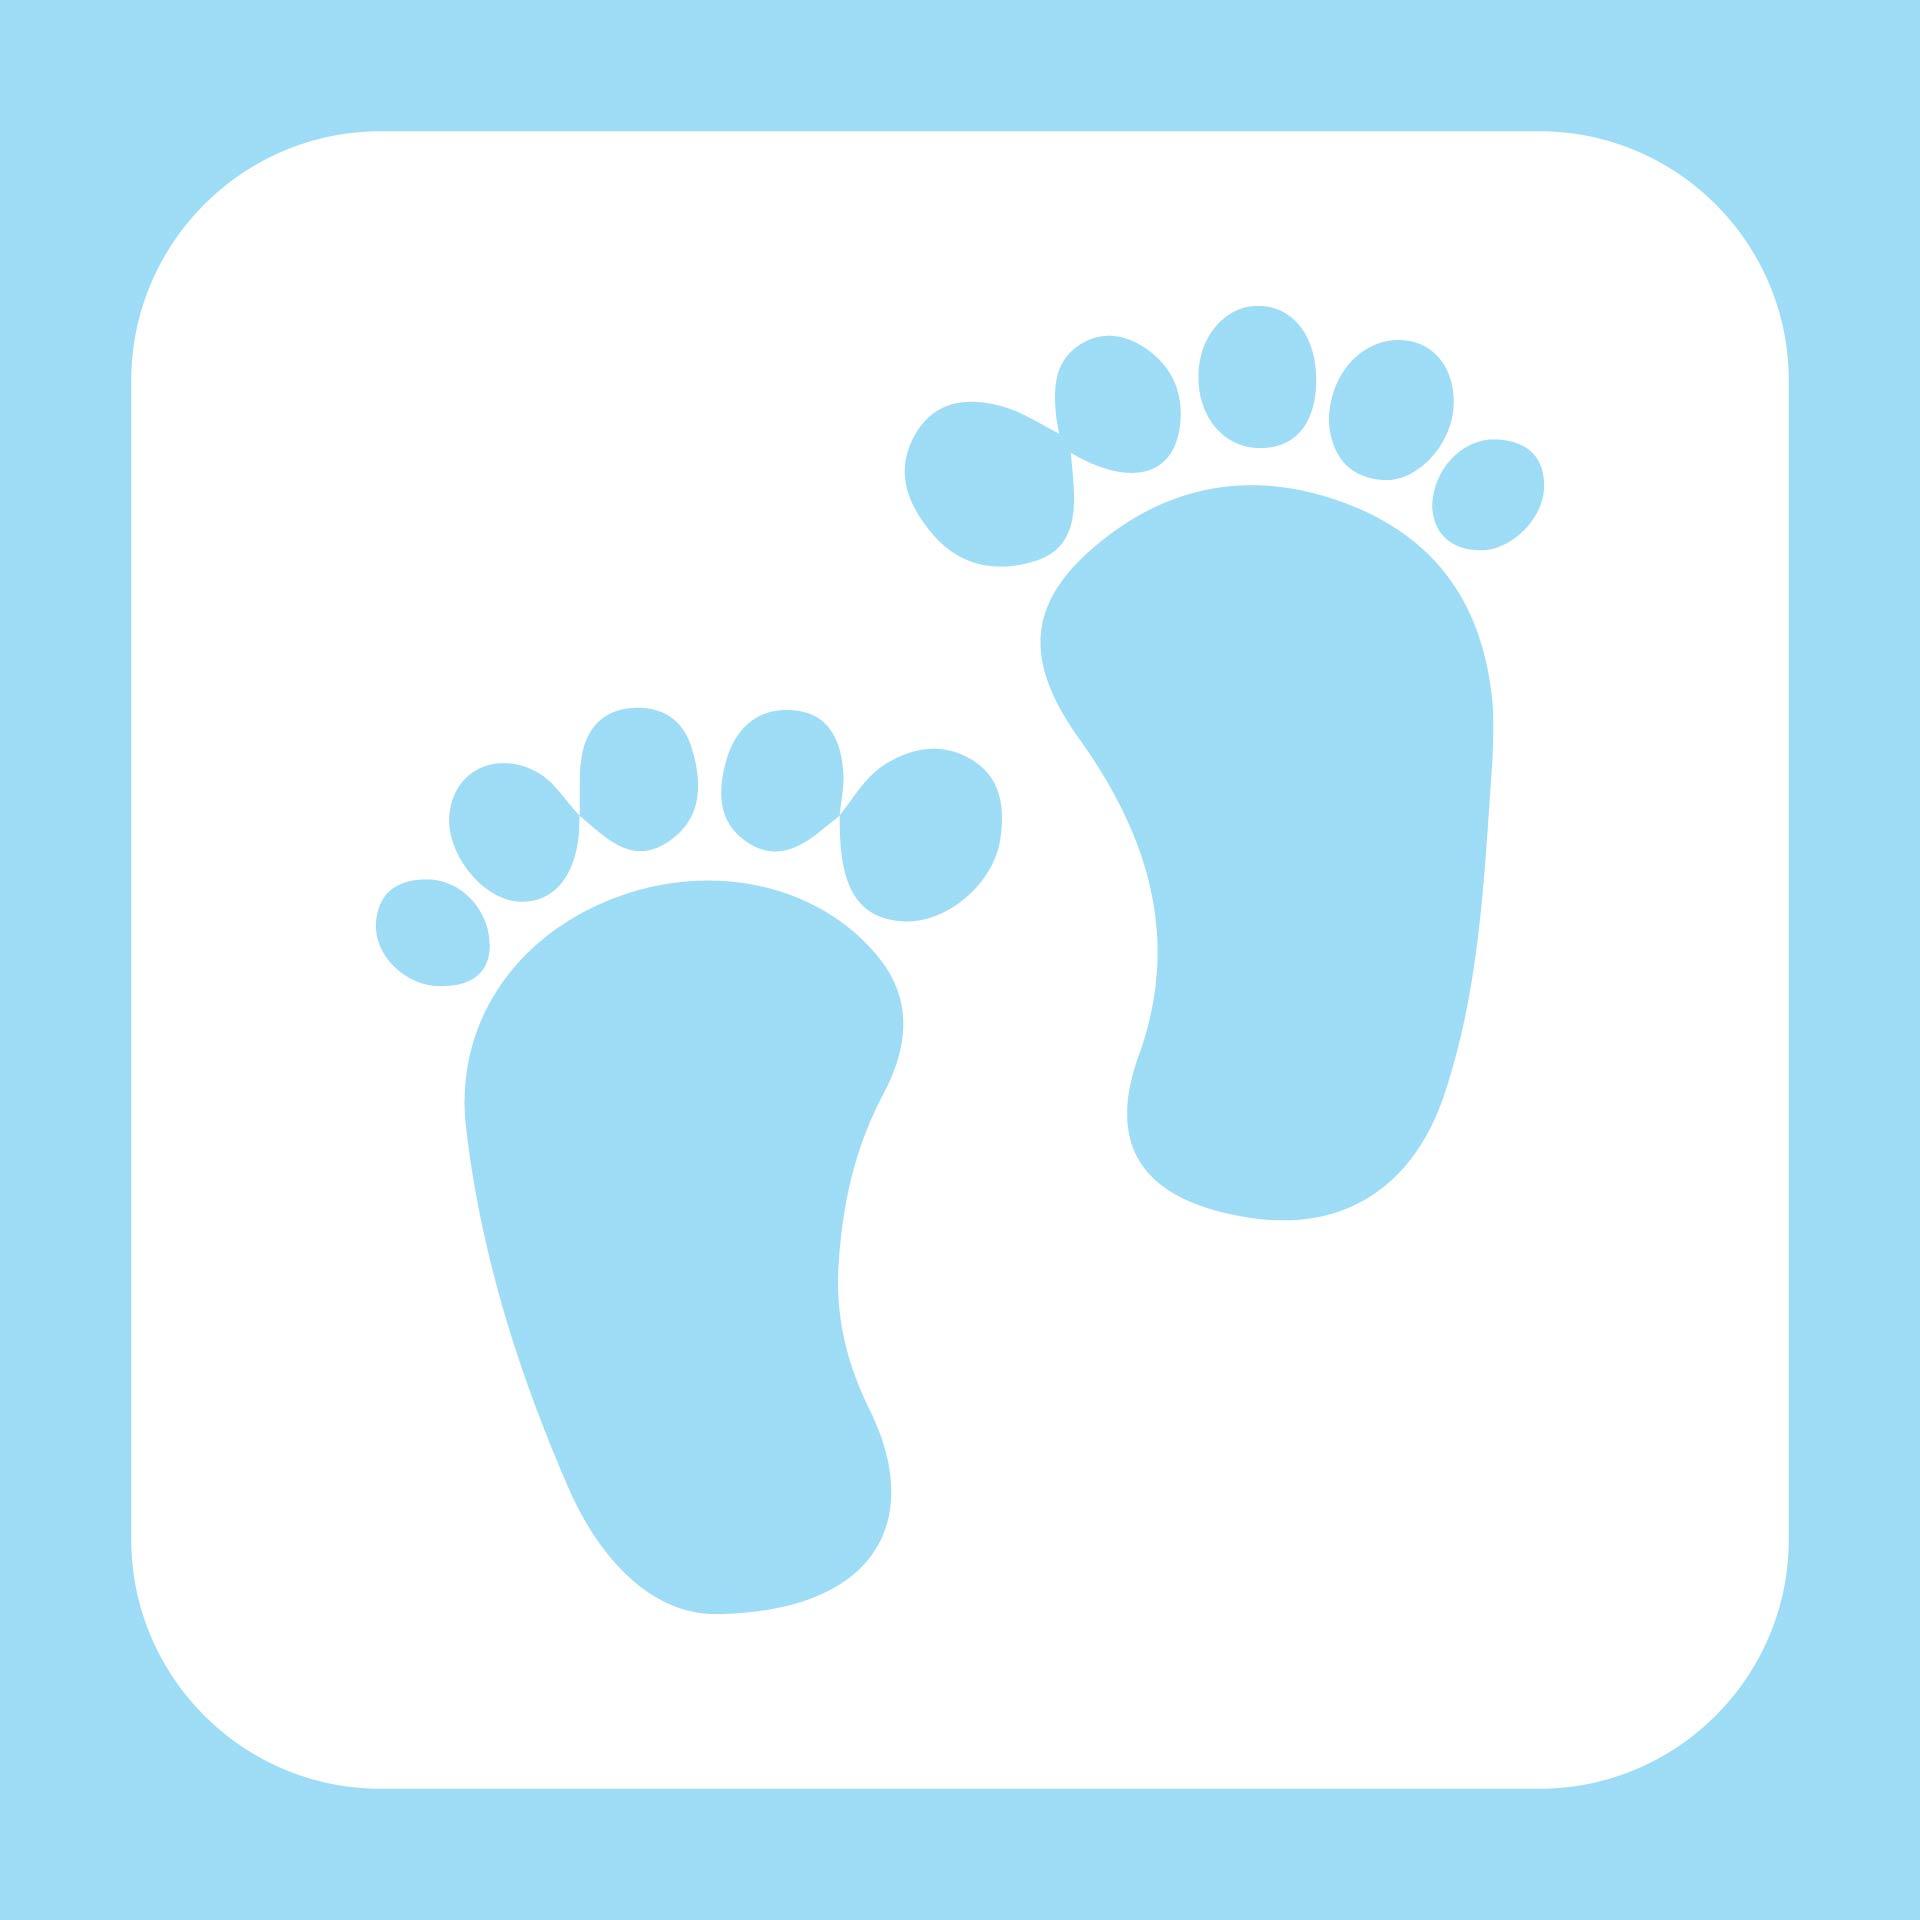 Baby Footprint Stencil Template